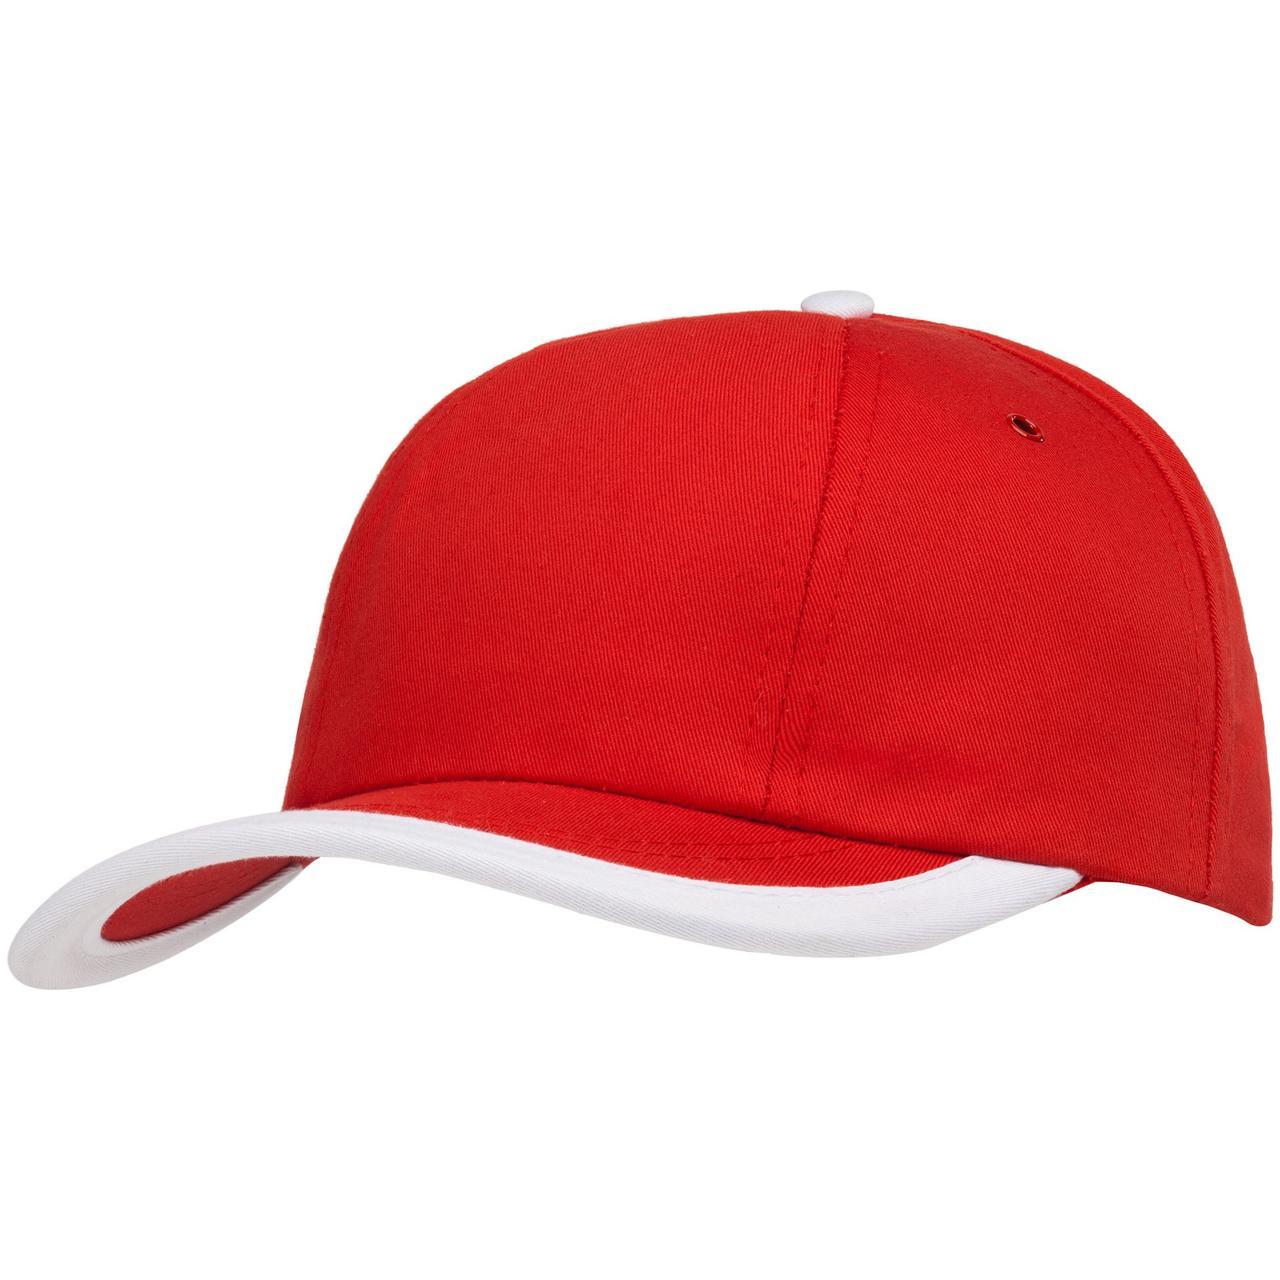 Бейсболка Bizbolka Honor, красная с белым кантом (артикул 11179.50)